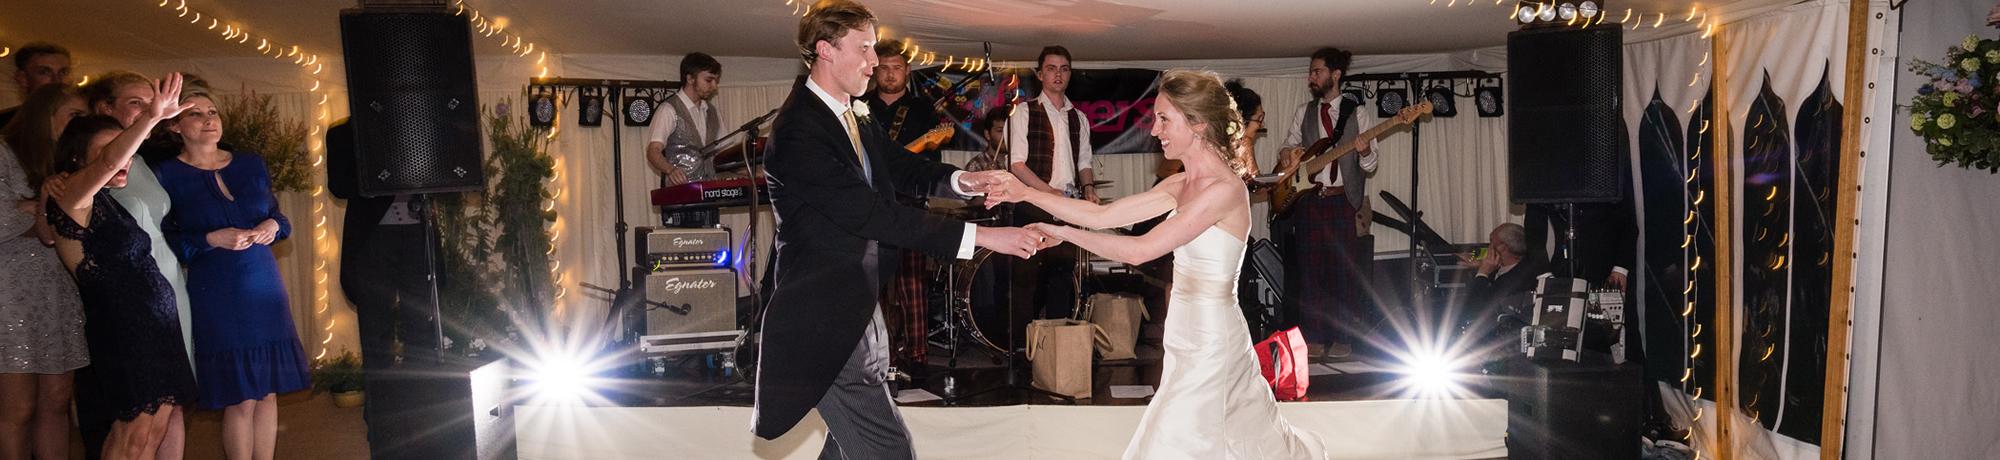 banner-wedding-marquee-hire